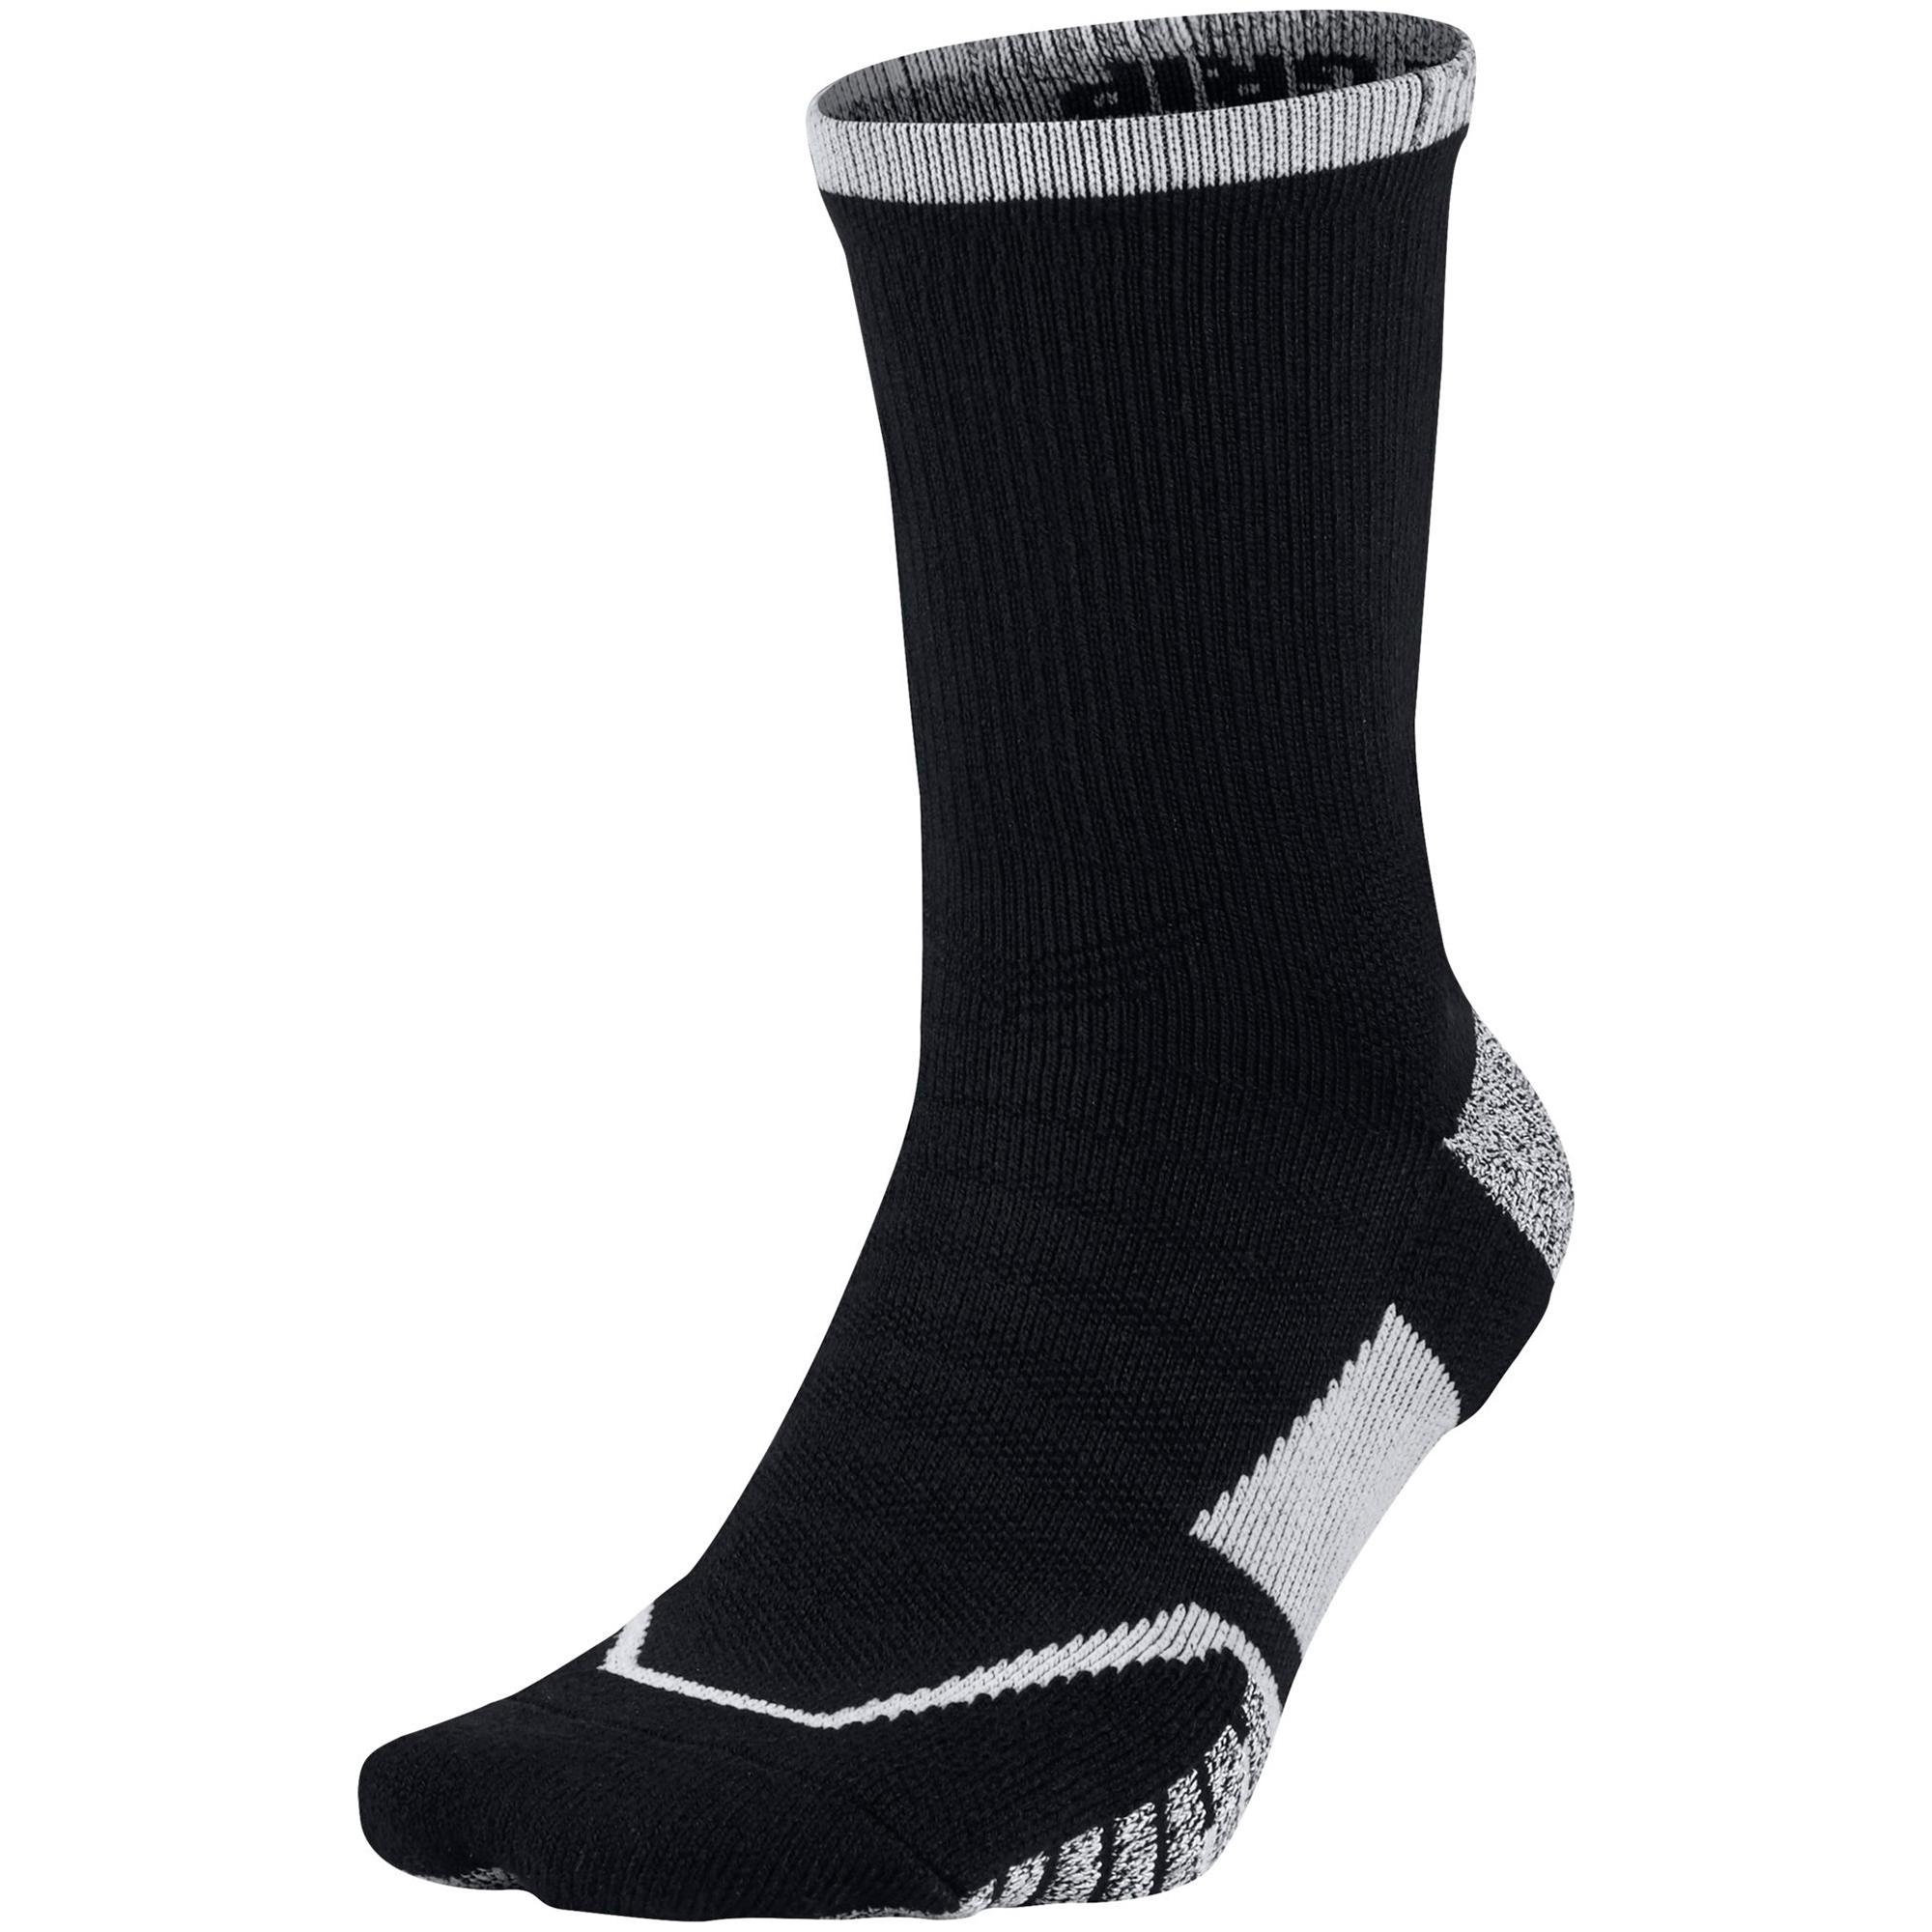 Nike Grip Elite Crew Tennis Socks (1 Pair) - Black/White ...